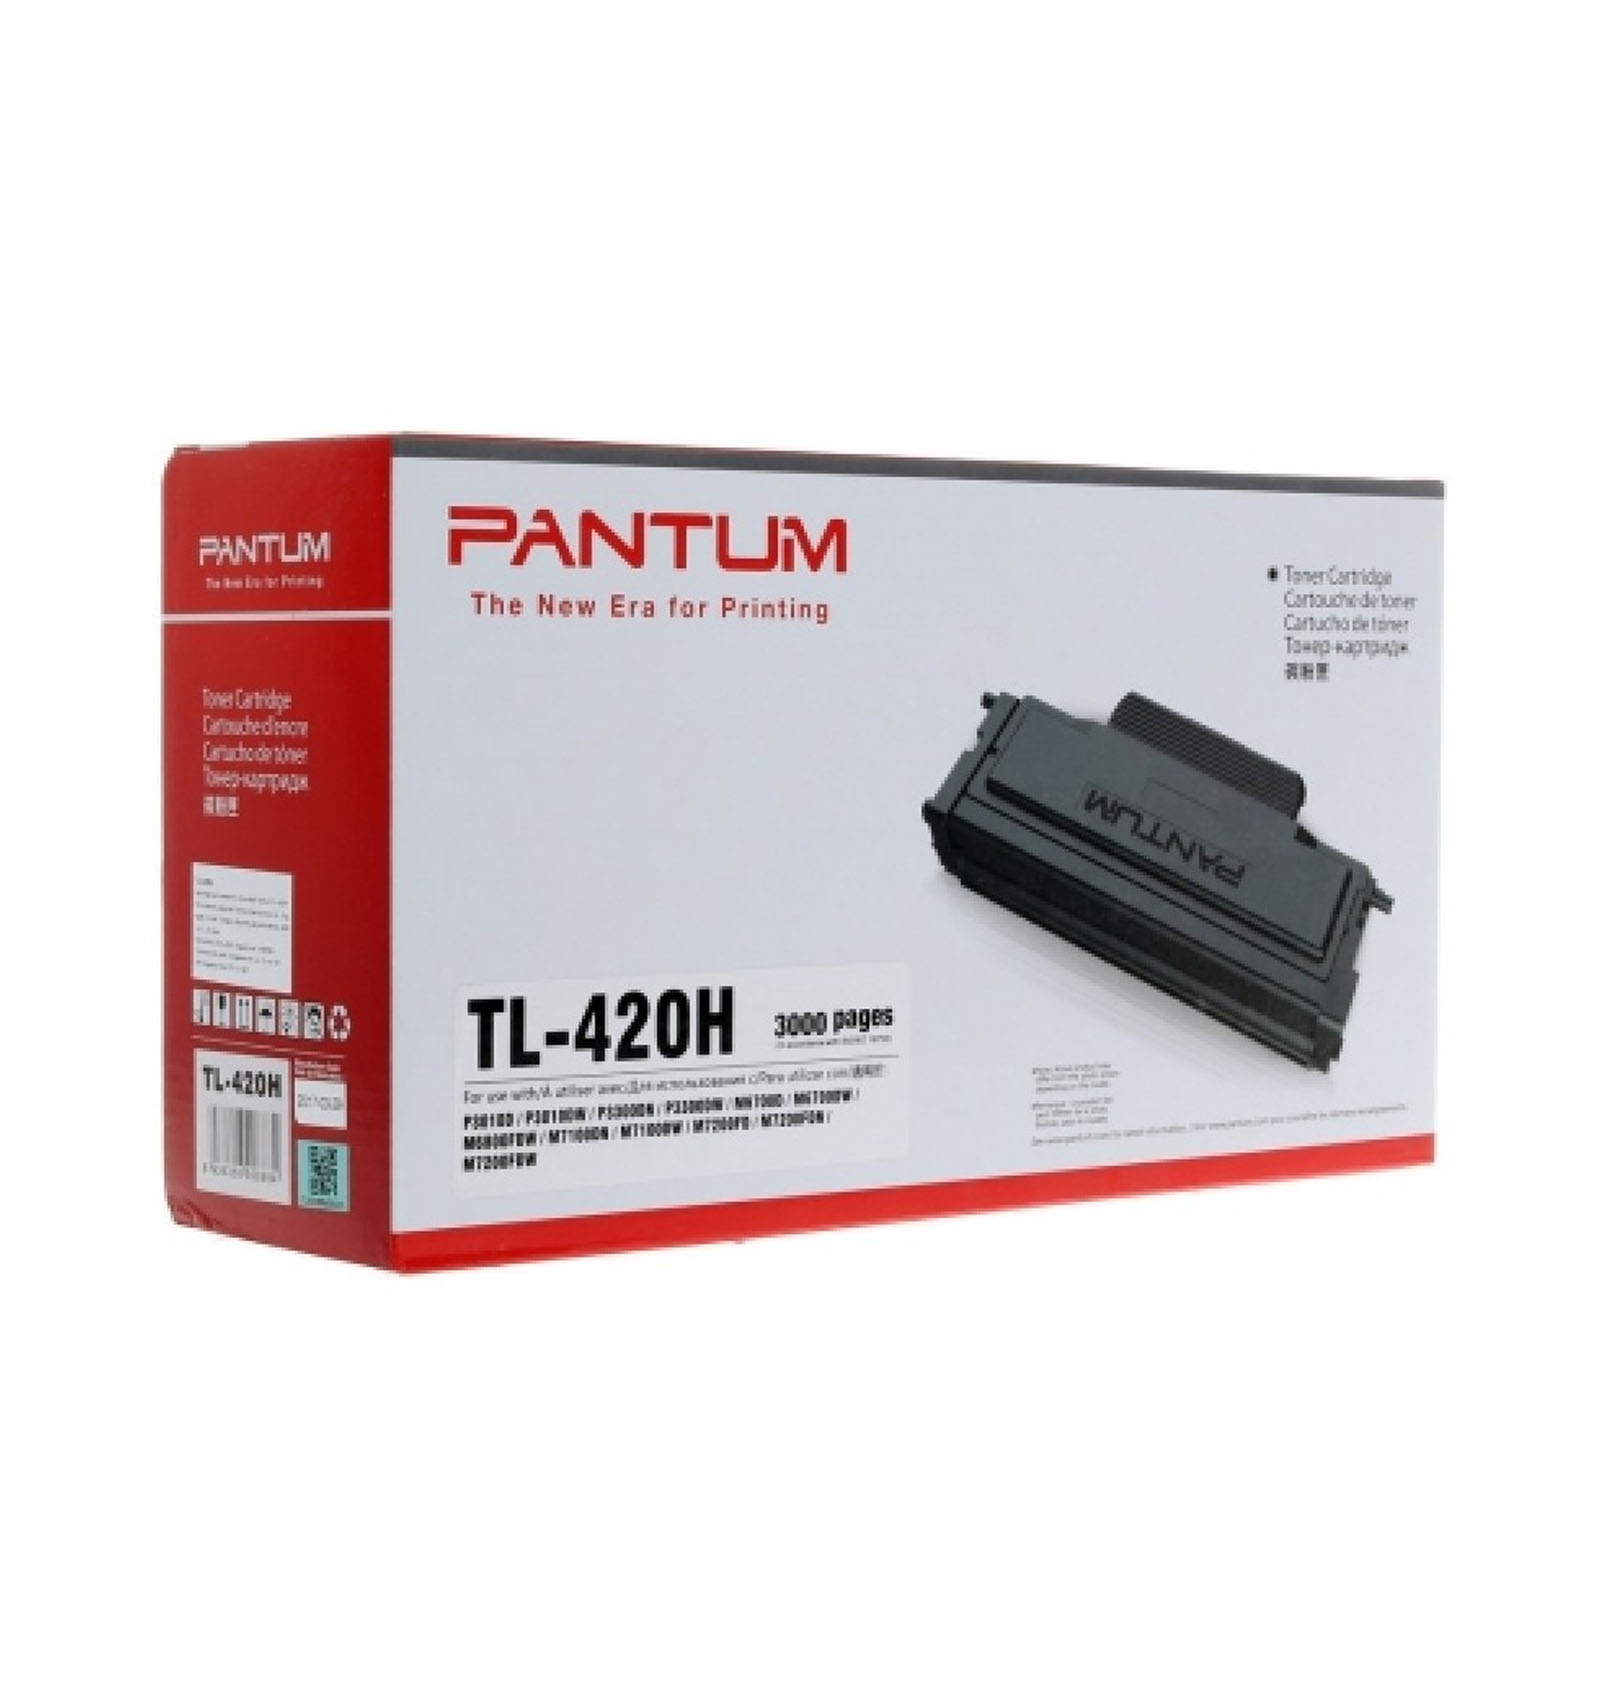 Заправка картриджа Pantum TL-420 для Pantum P3010/P3300/M6700/ M7100/M6800/M7200